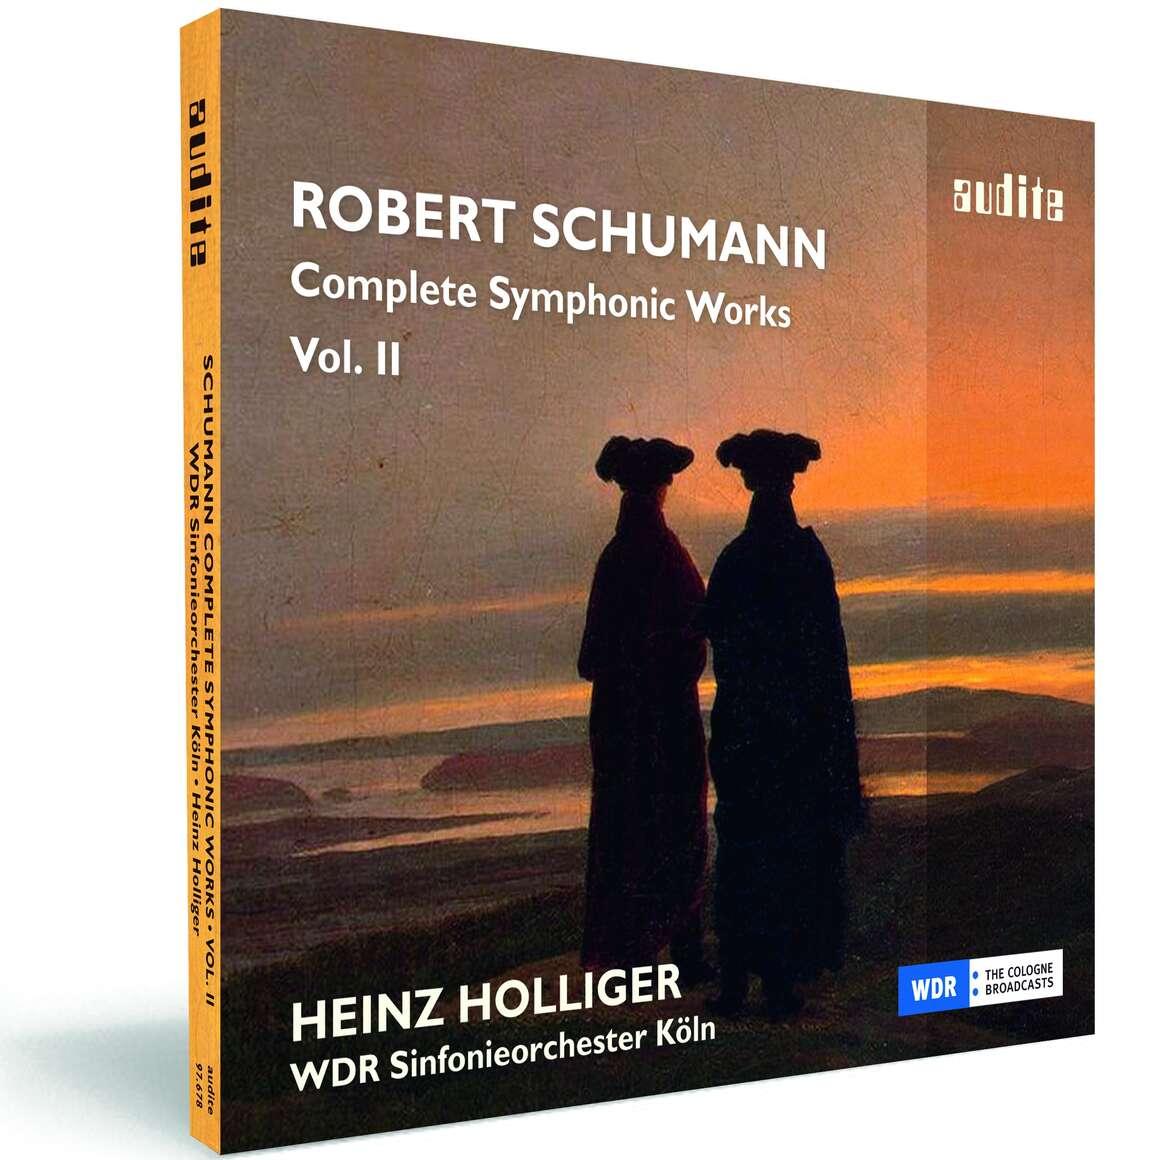 R. Schumann: Complete Symphonic Works, Vol. II